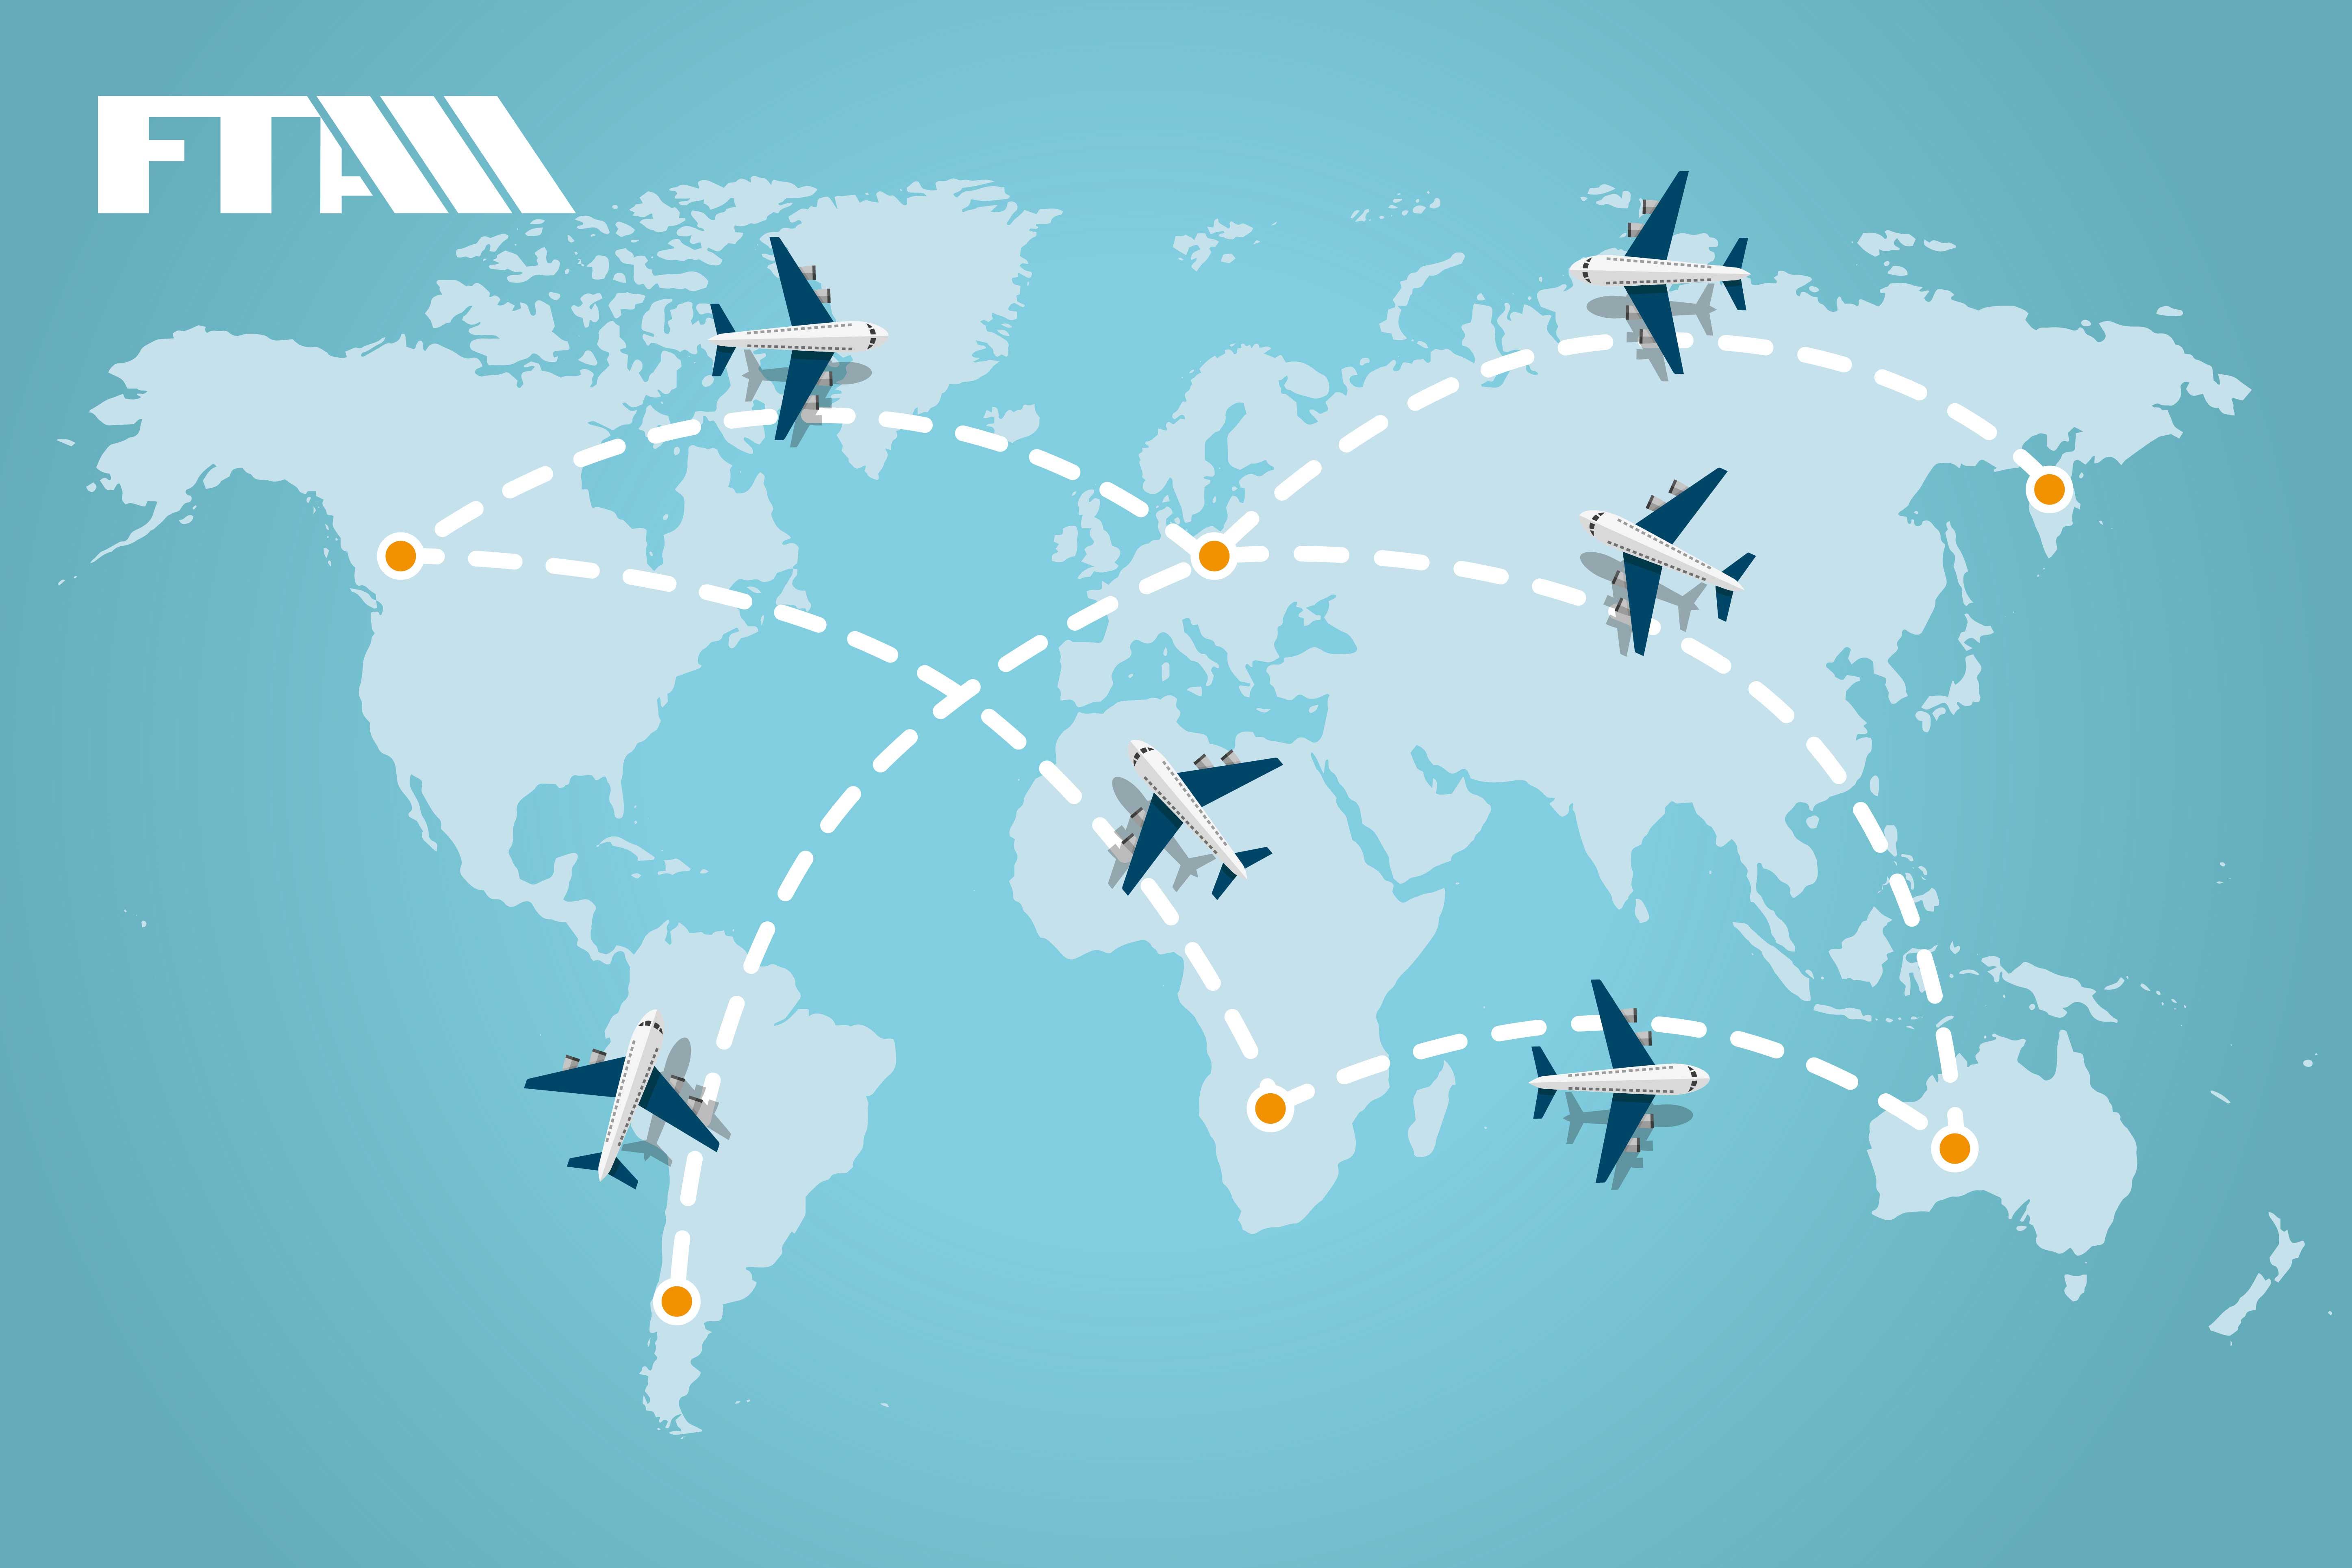 Travel_the_world_FTA-logo.jpg